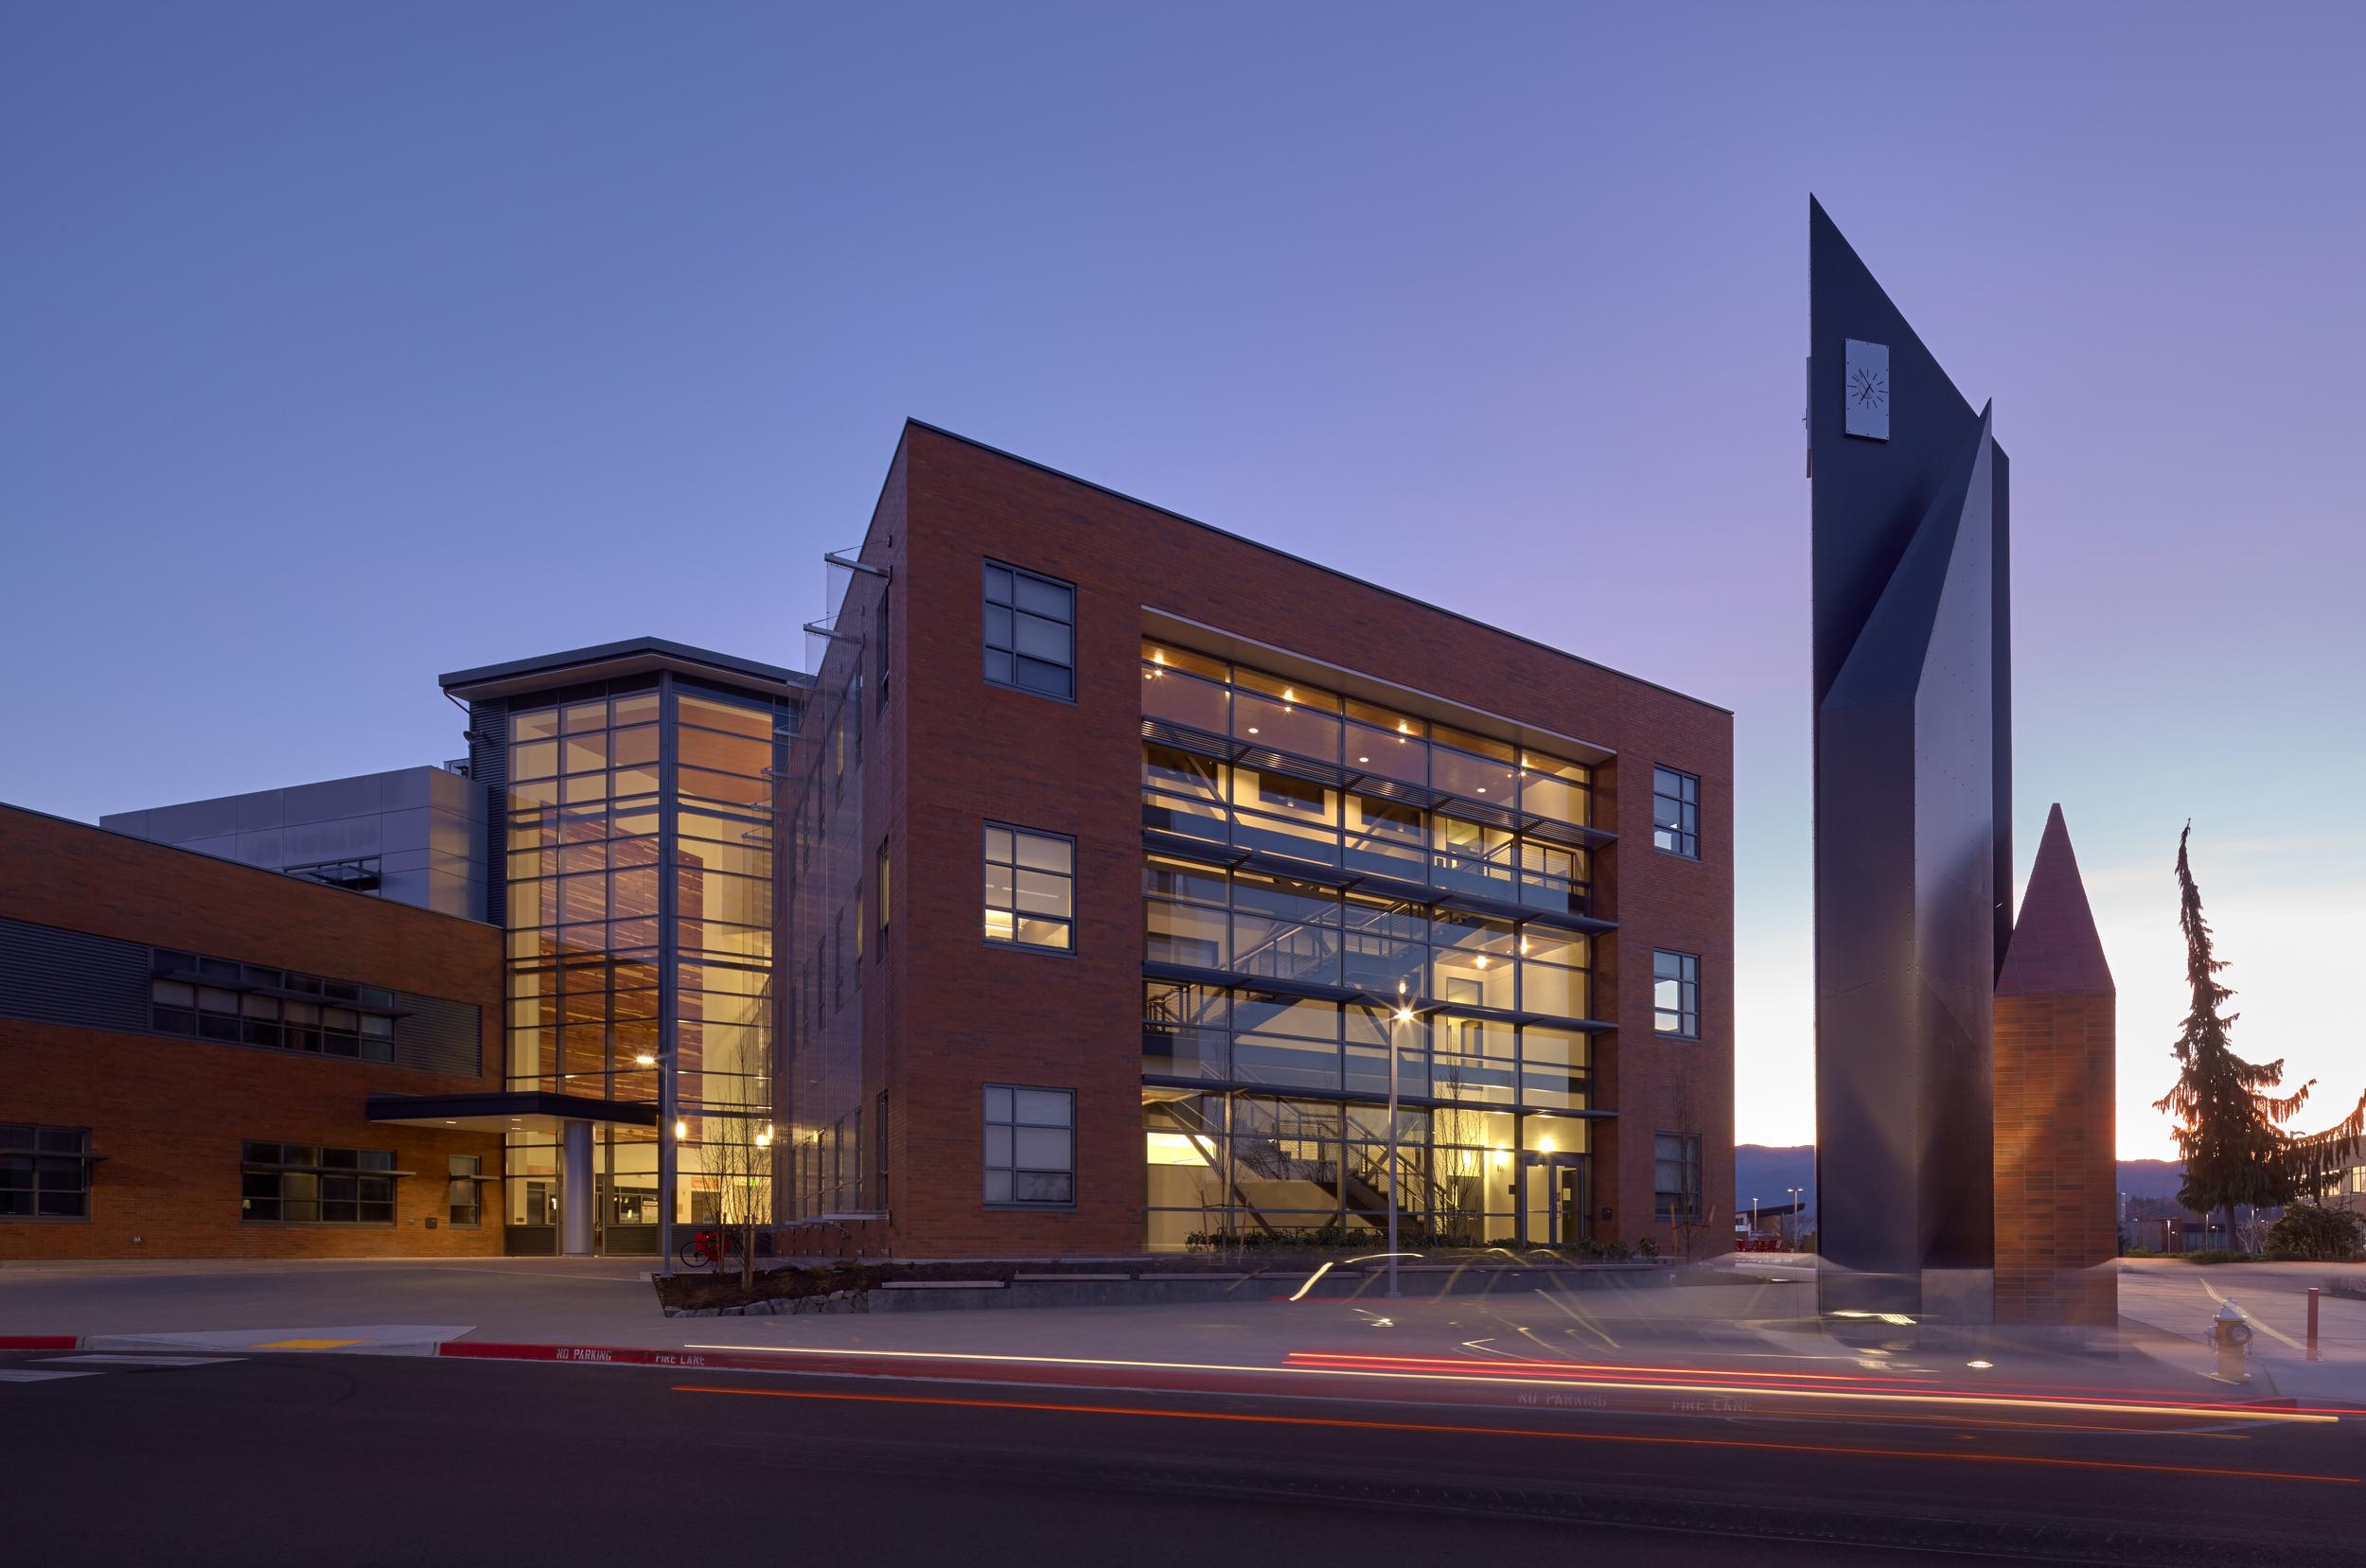 Architecture in the Public Interest